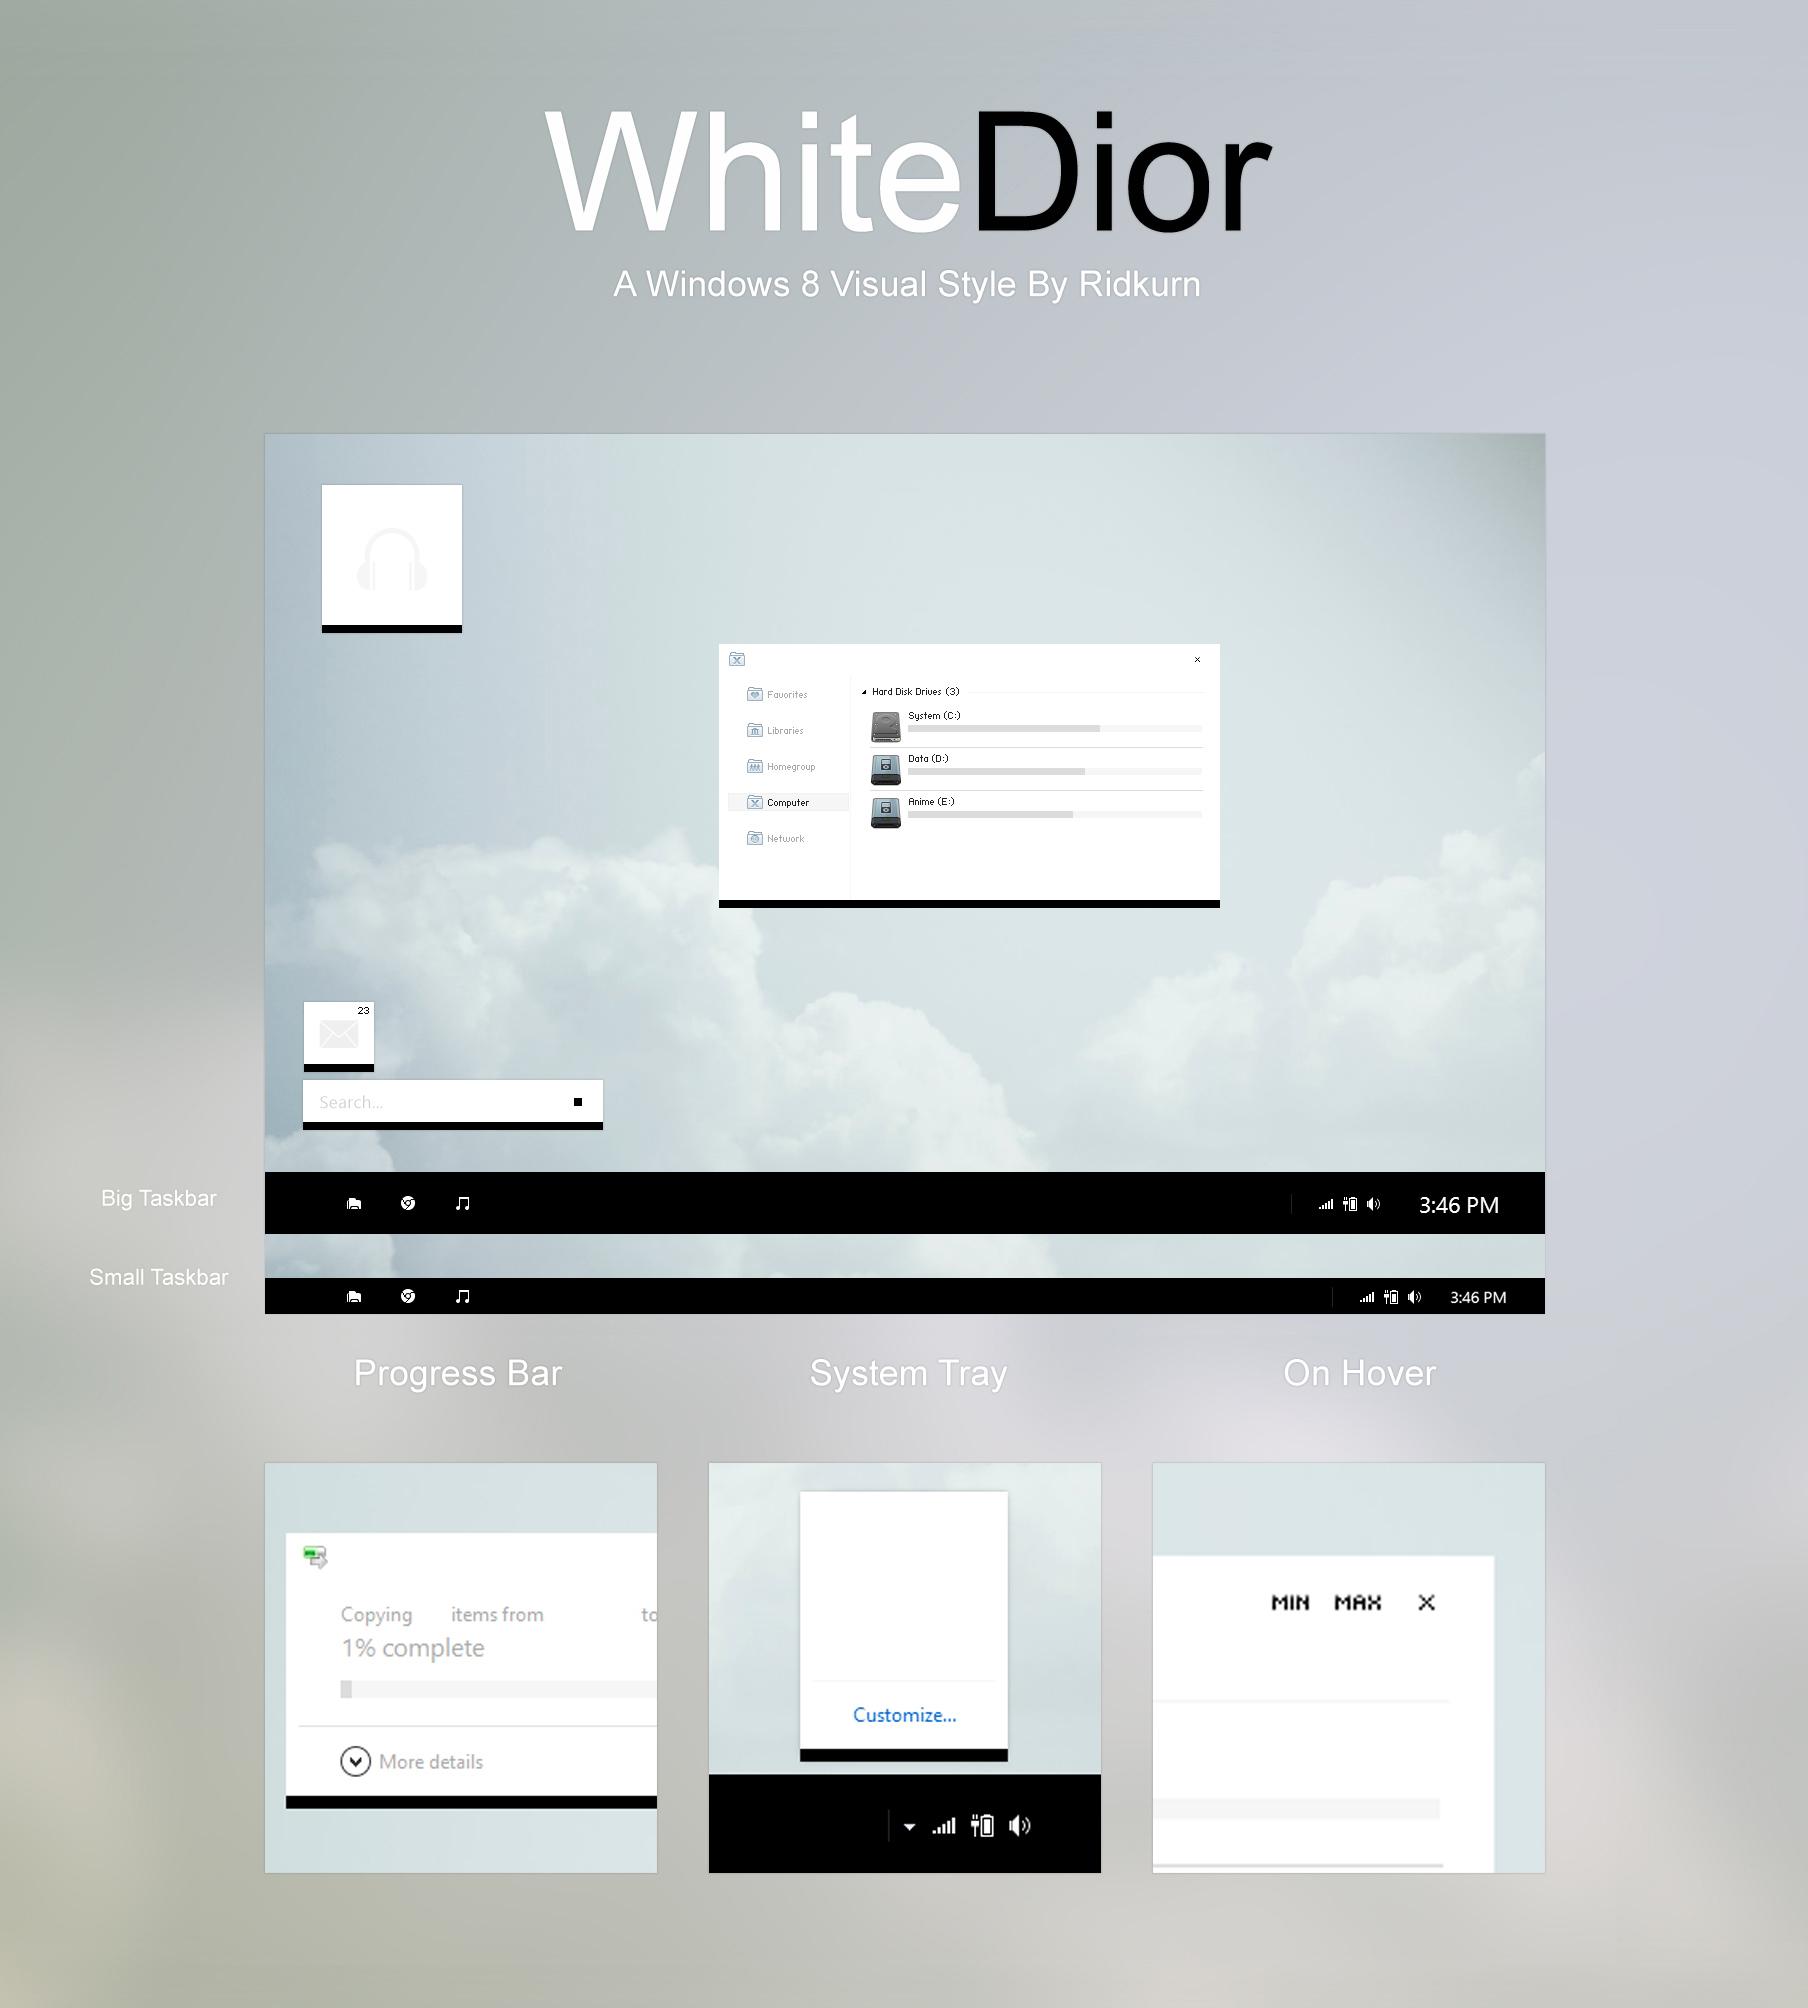 [UPDATE] WhiteDior Visual Style for Windows 8/8.1 by RidKurn